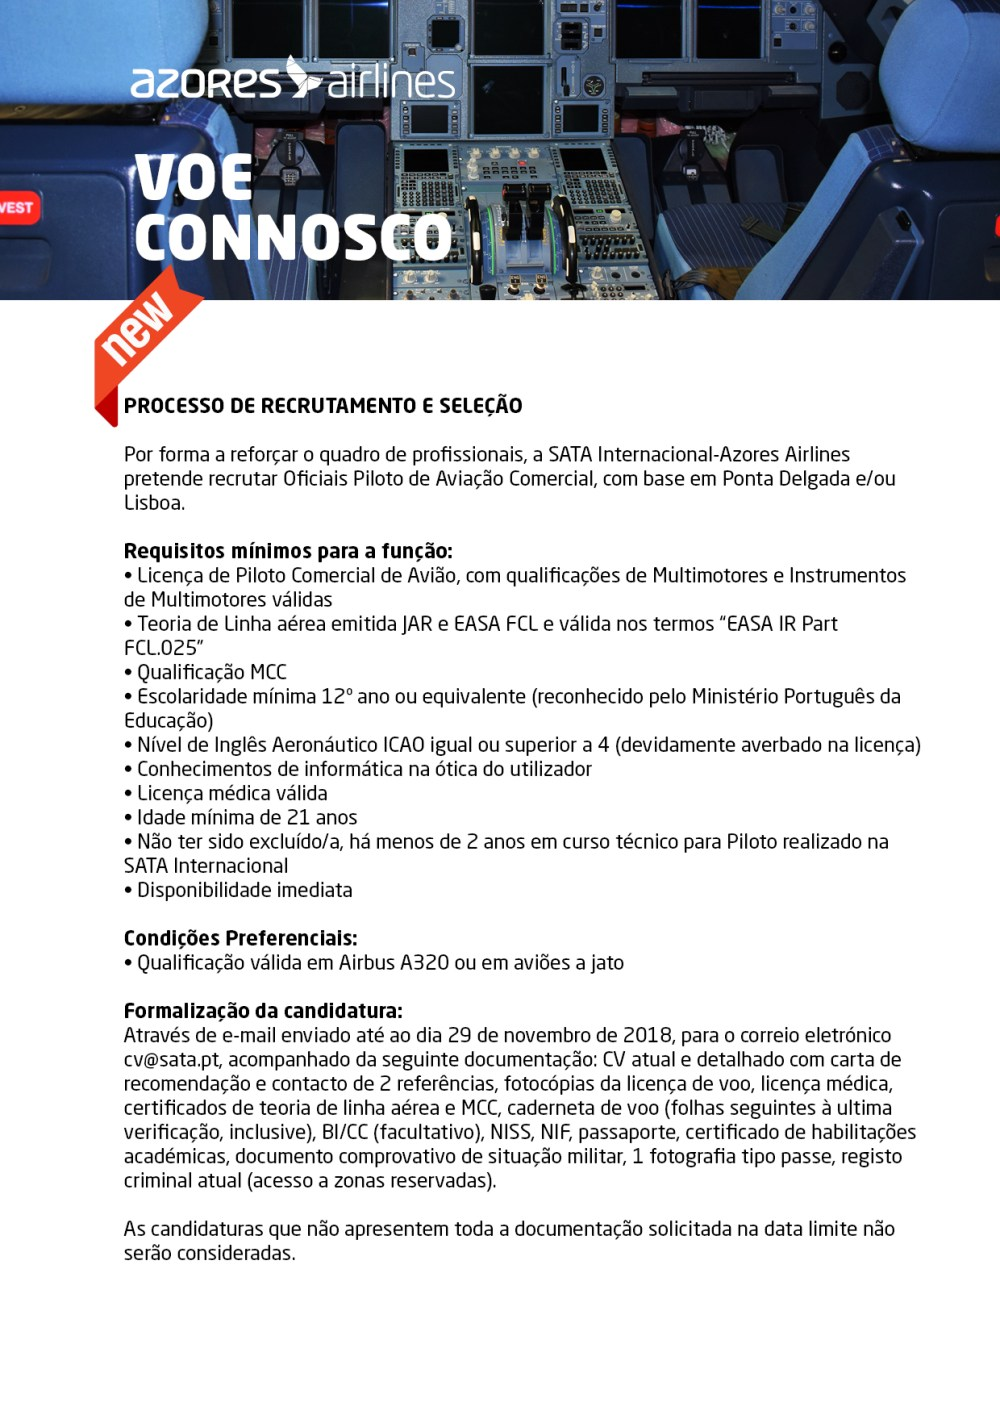 Recrutamento_OficiaisPilotos_Anuncio_nov2018_net